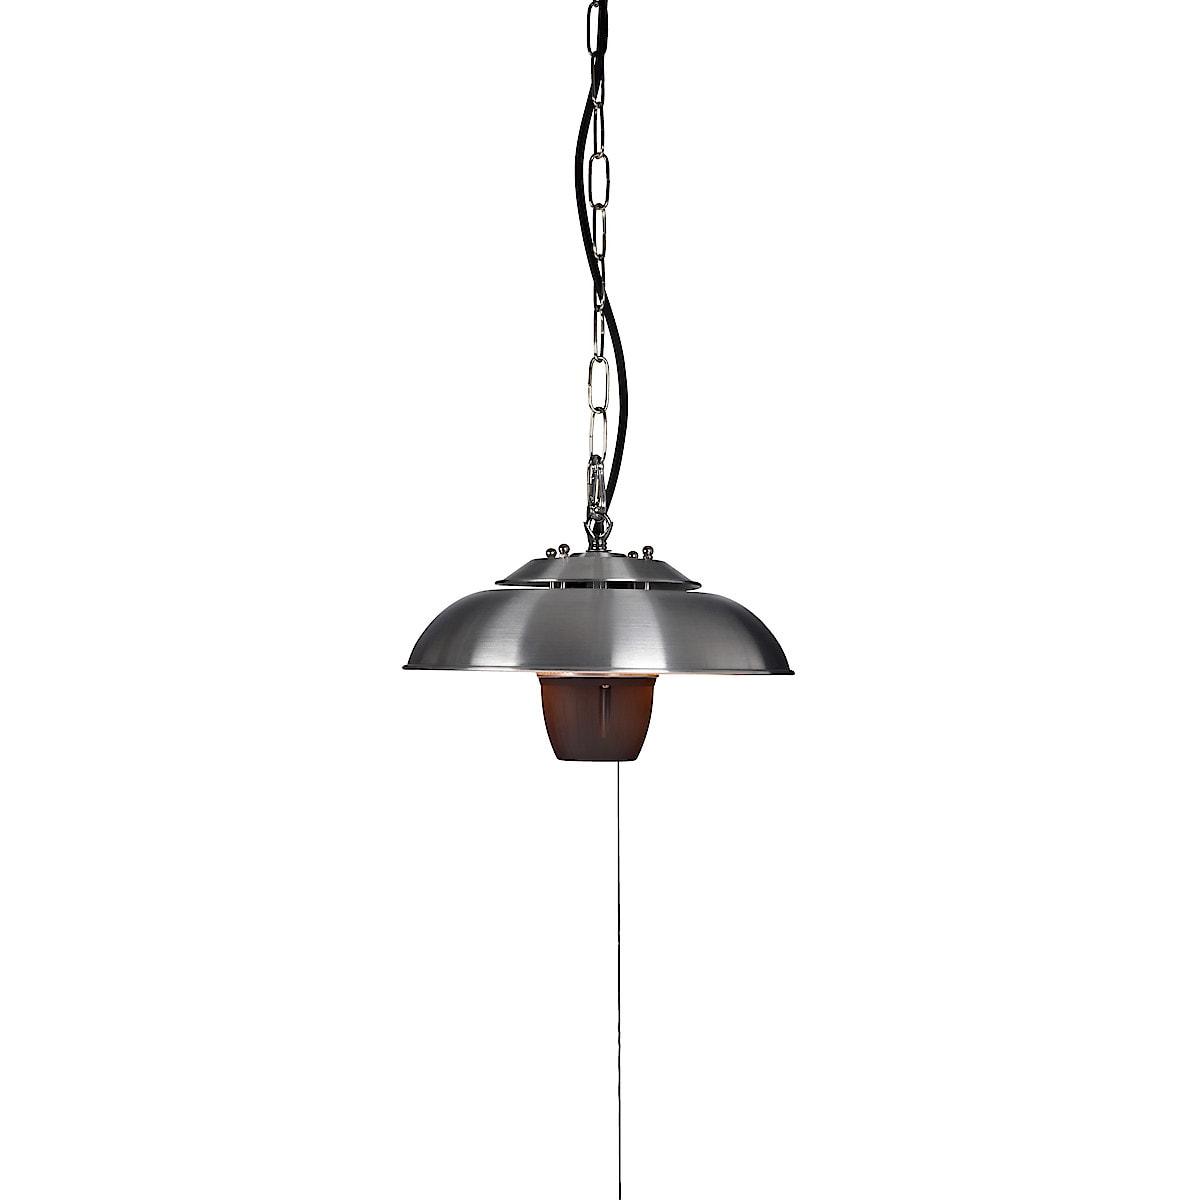 Parma 750 W hanging patio heater